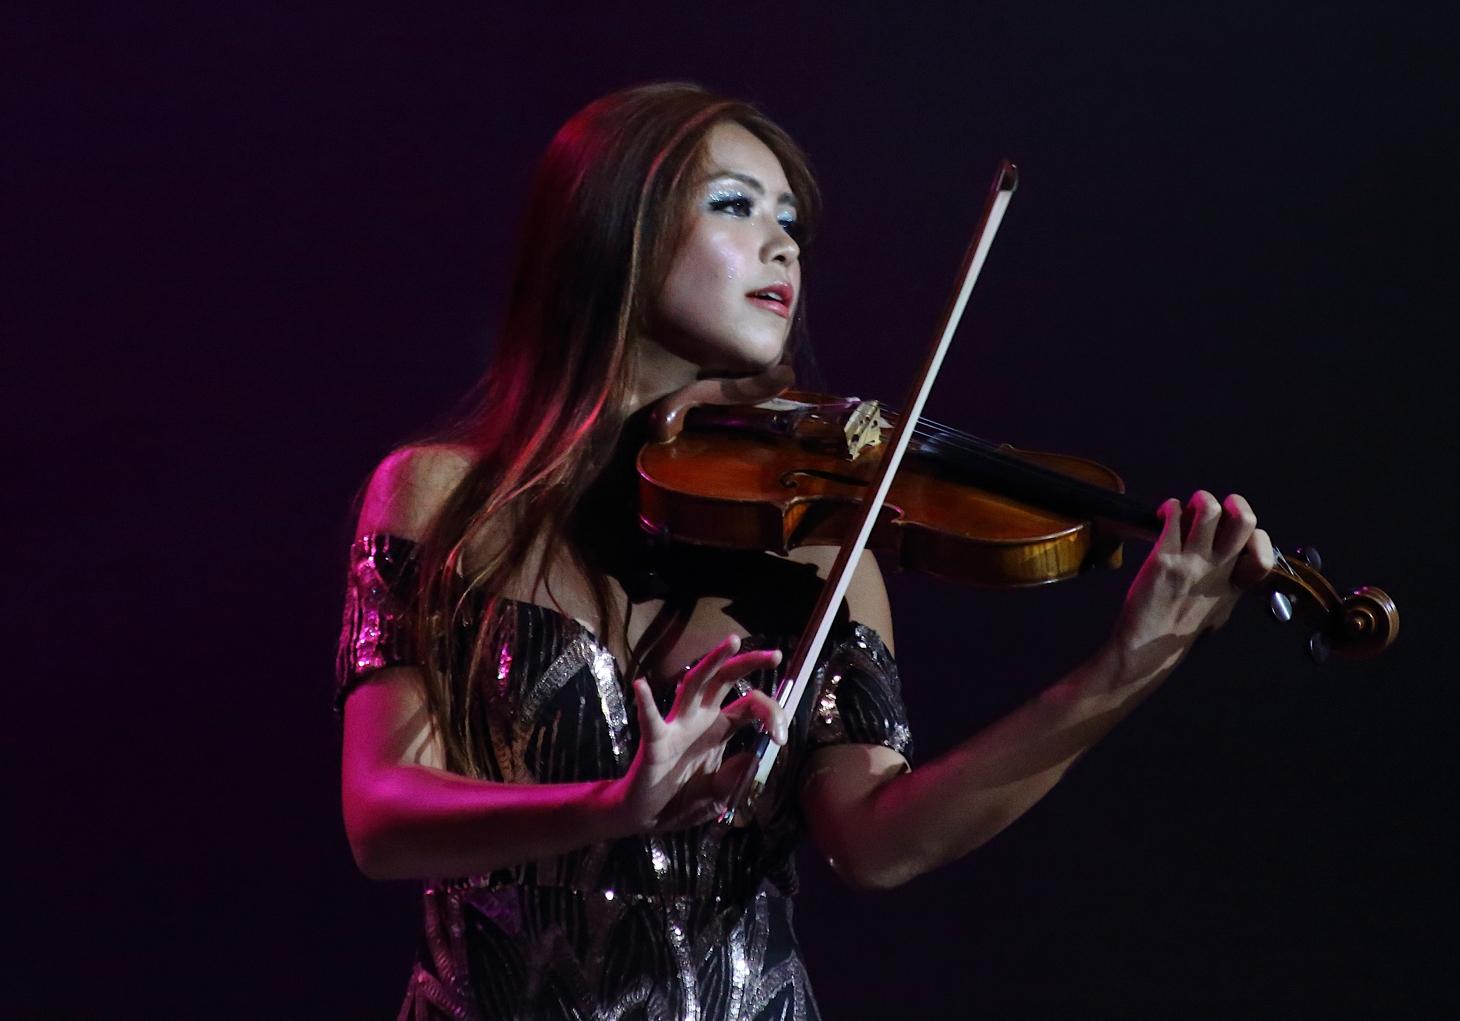 venus usai chinese violinist